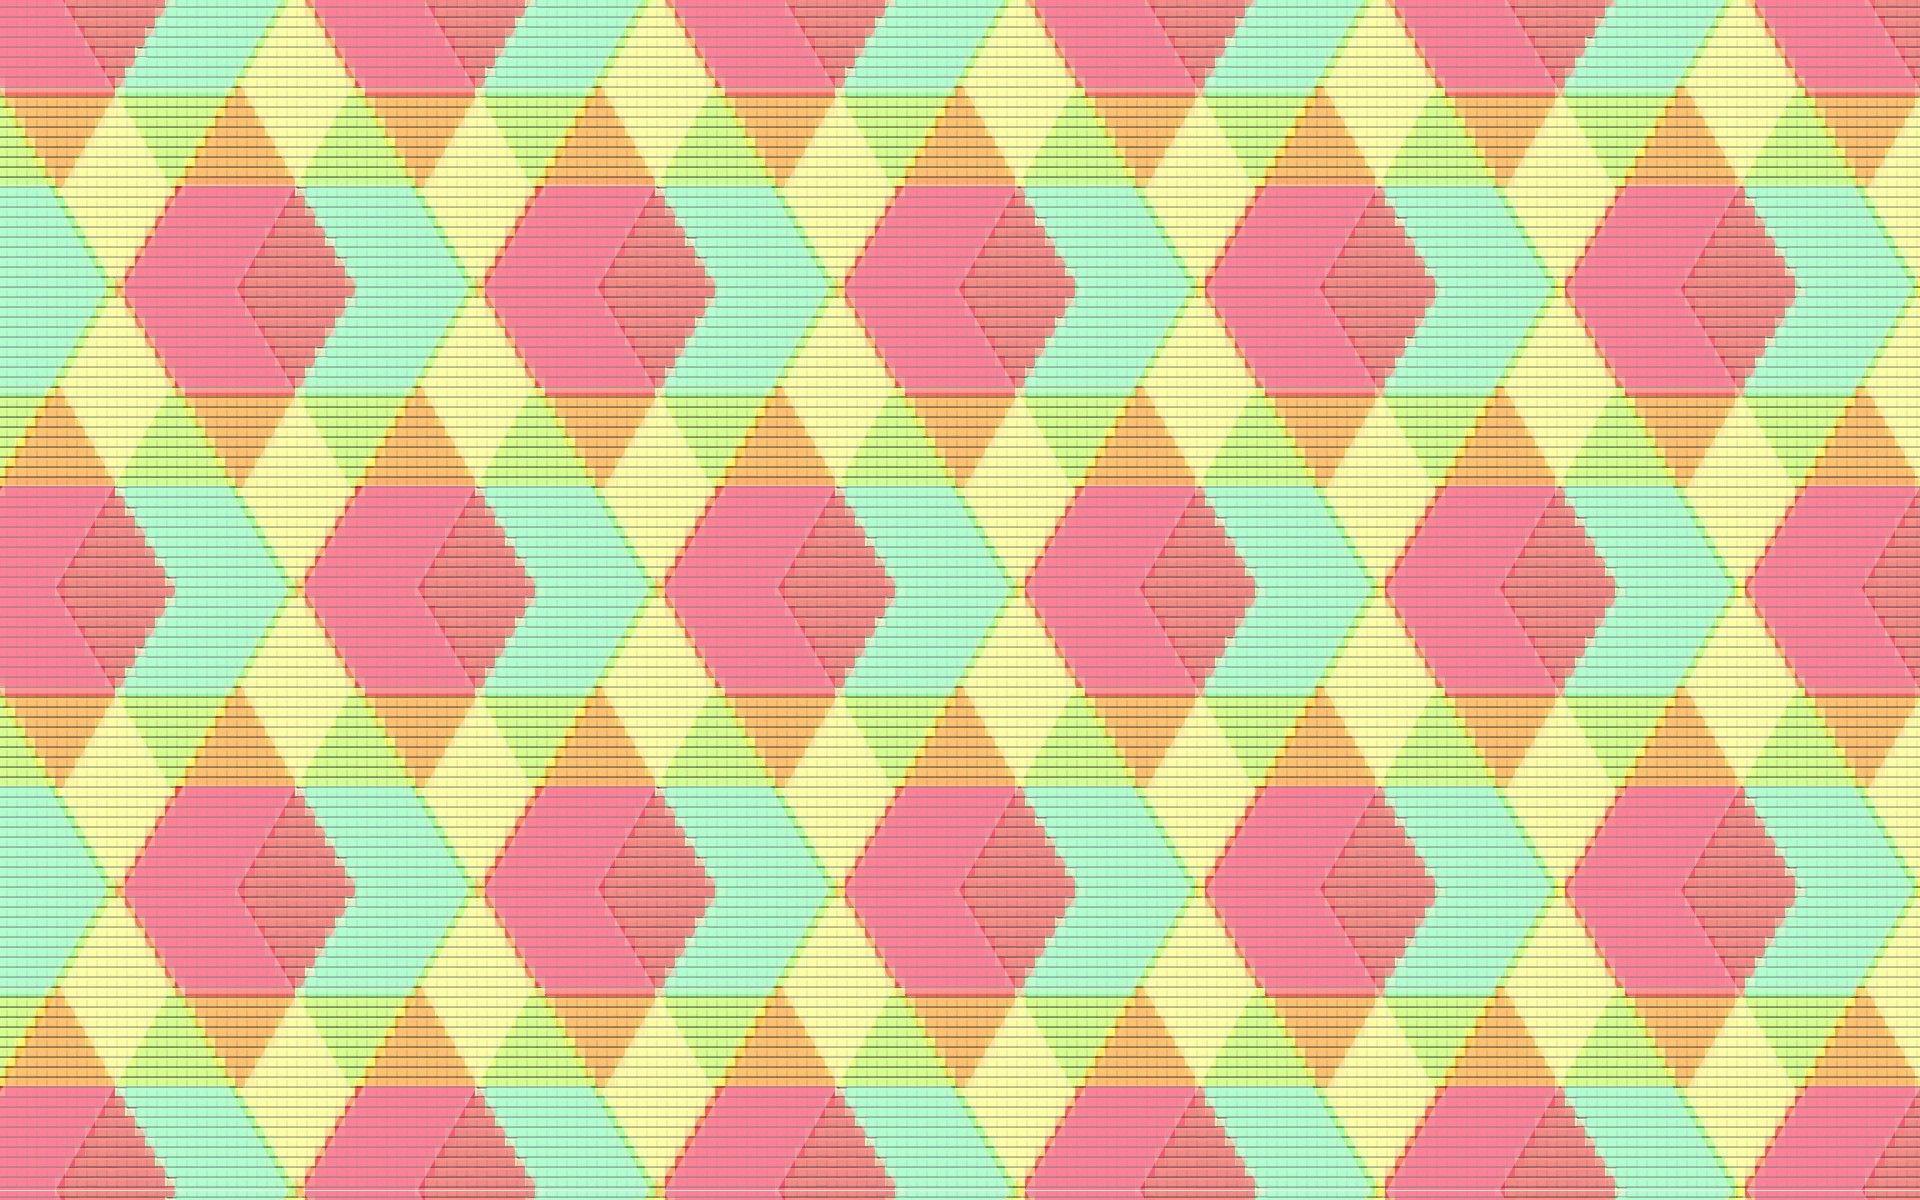 Imagenes Tumblr Colores Pastel: Textura Con Colores Pasteles-619049.jpg (1920×1200